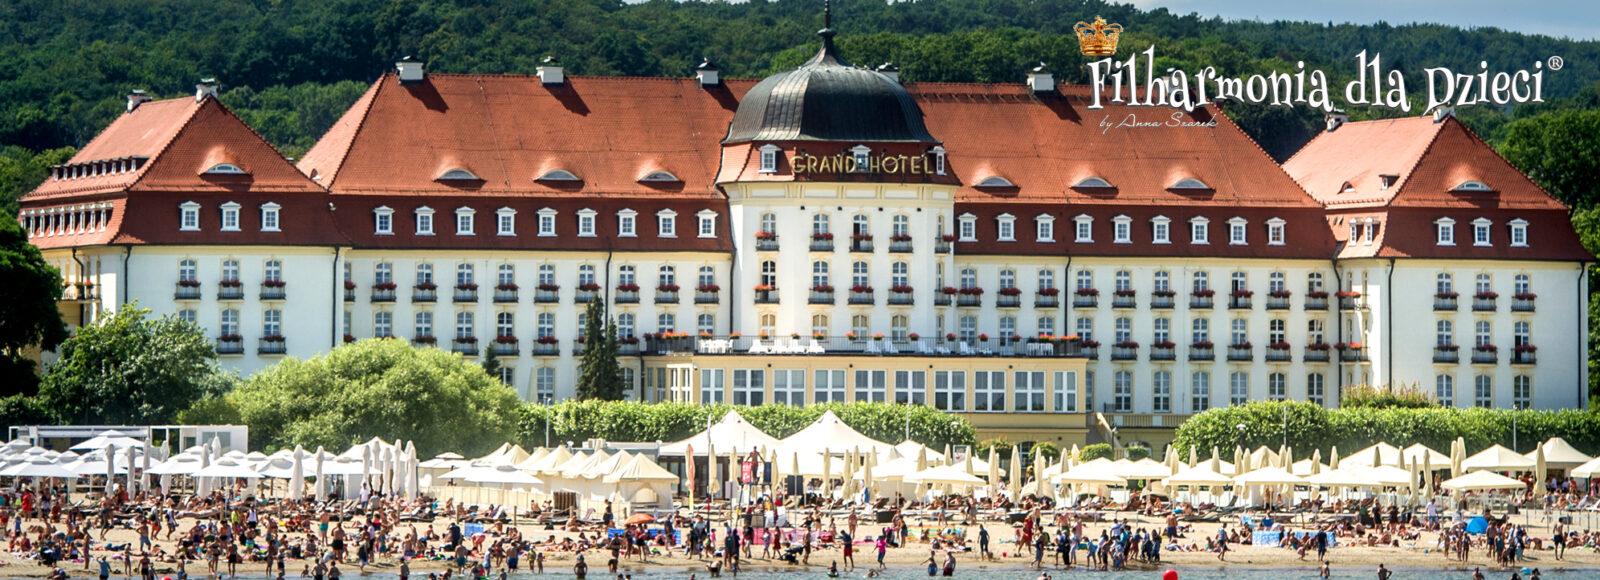 Grand Hotel Sopot - Filharmonia dla Dzieci